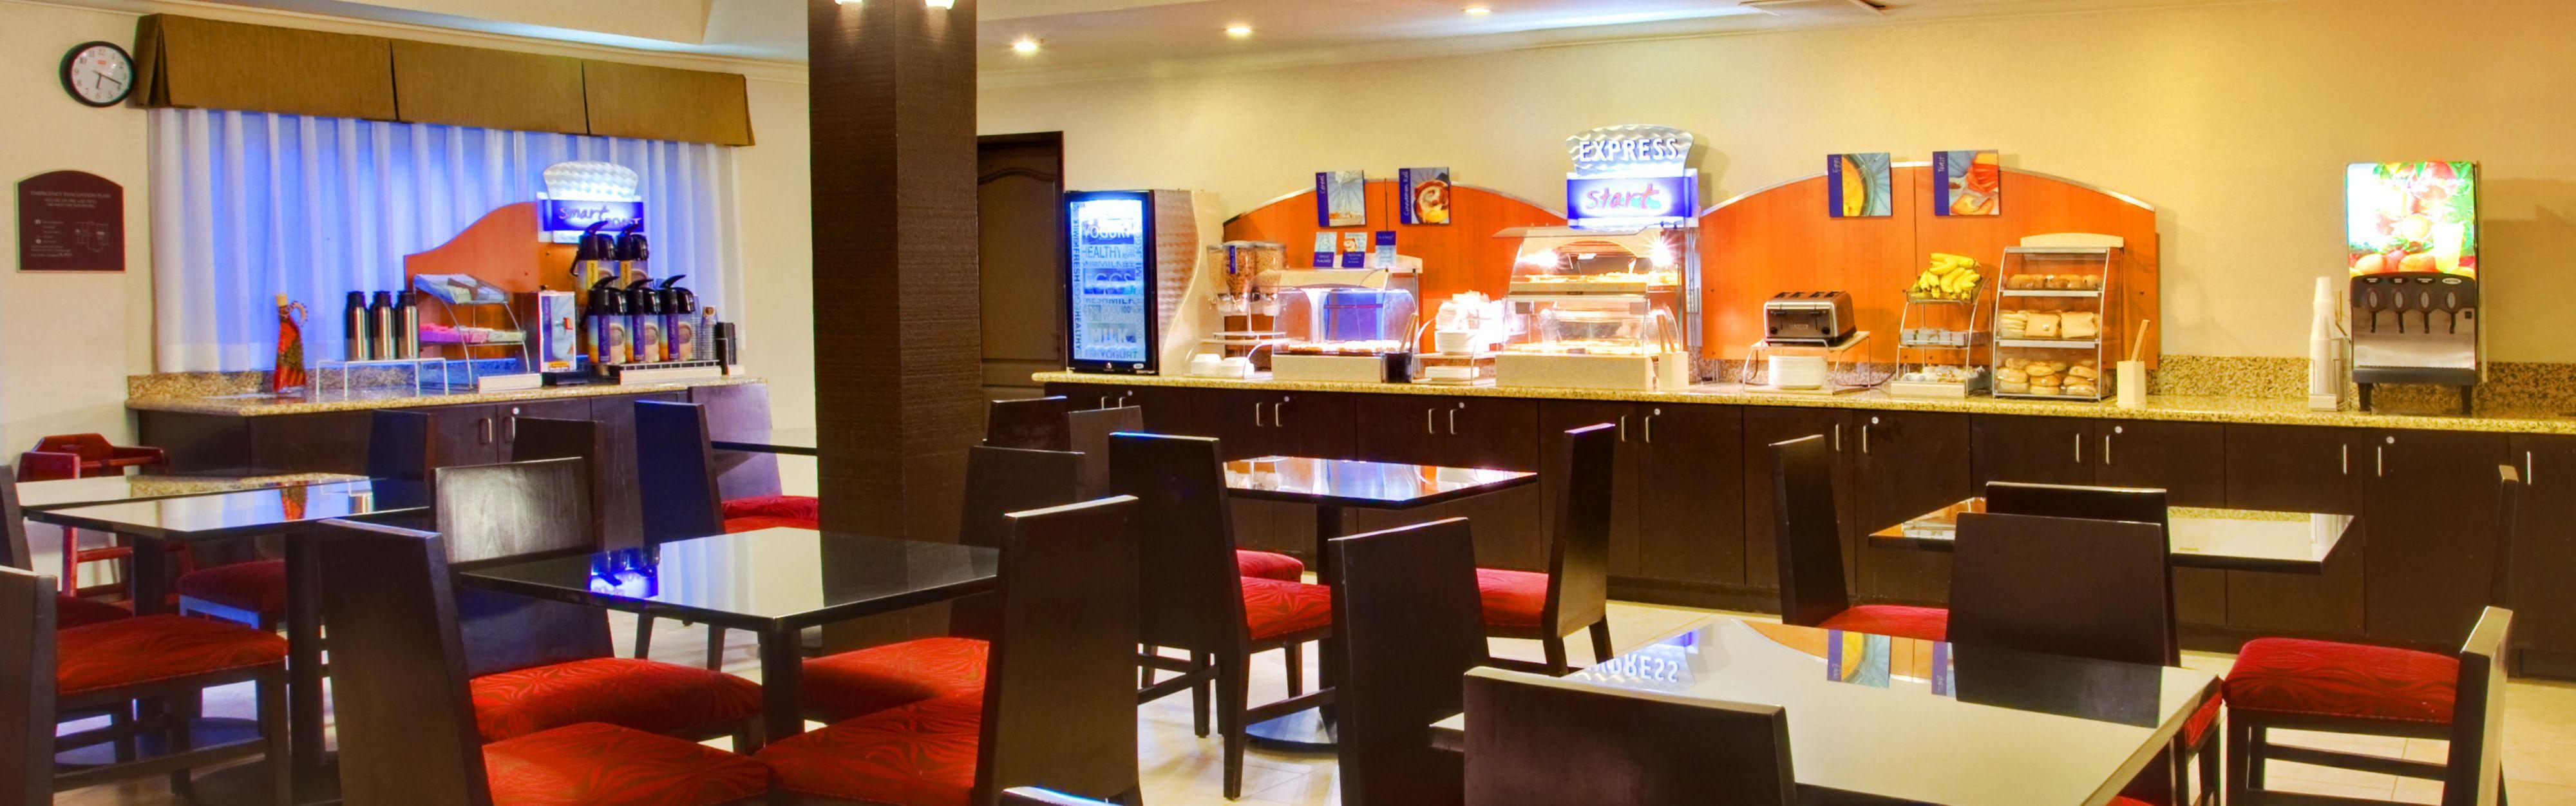 Holiday Inn Express Encinitas - Cardiff Beach Area image 3